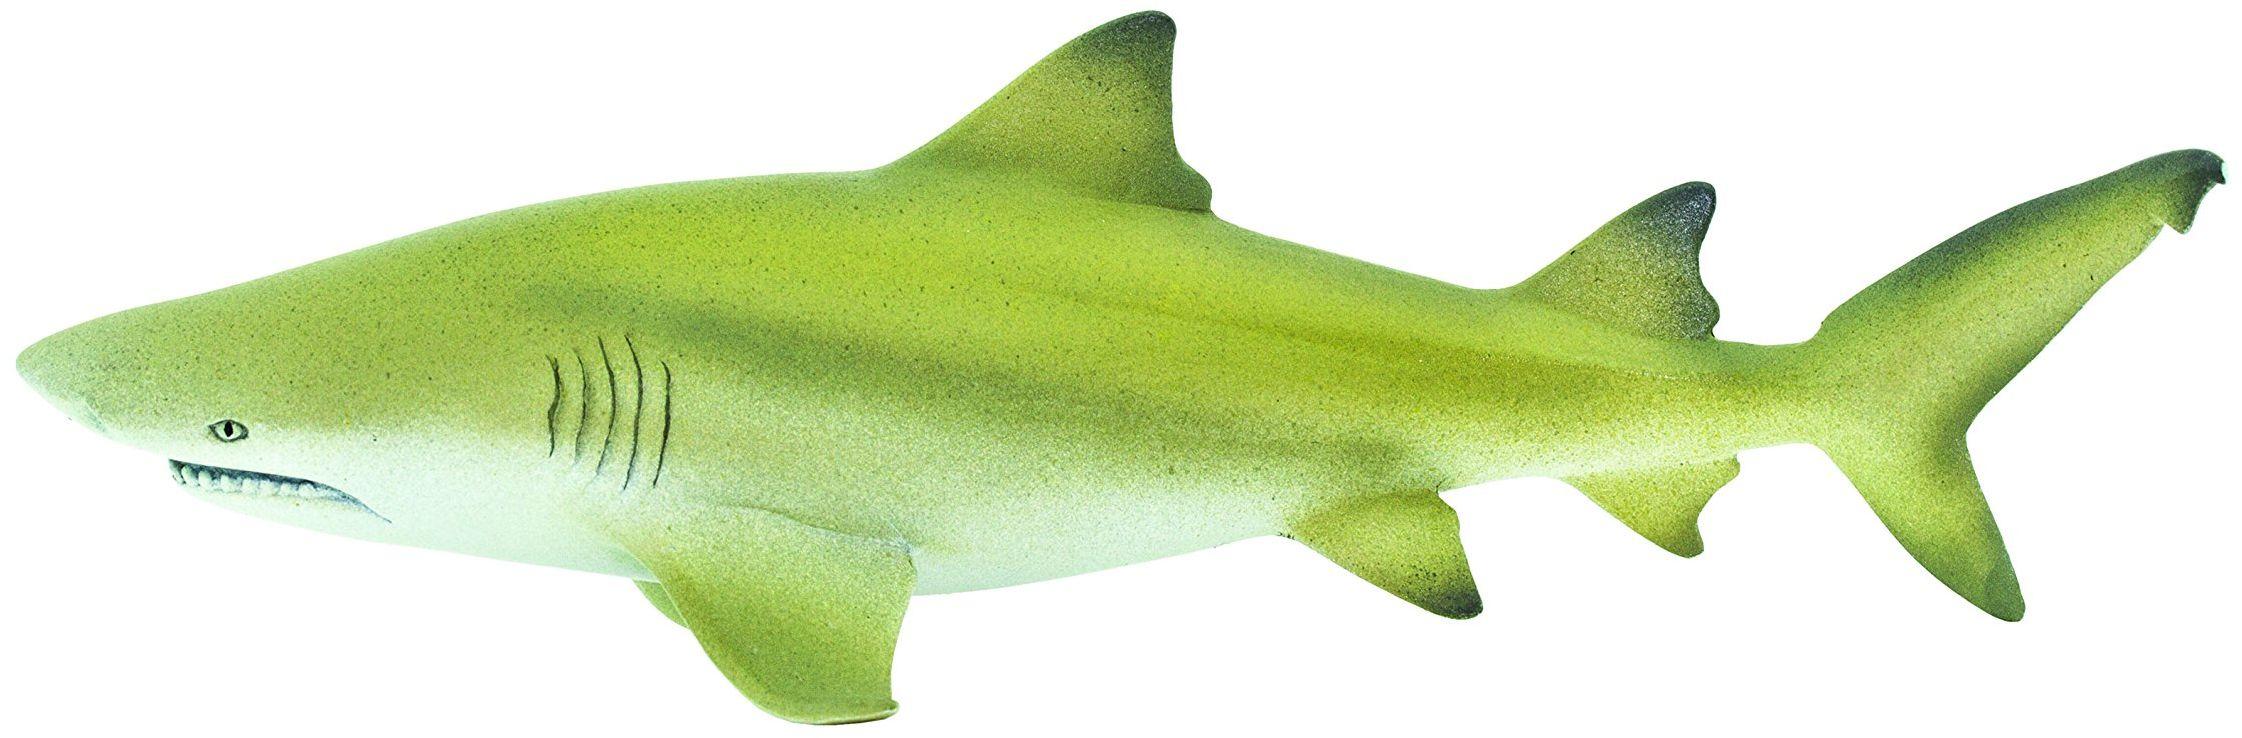 Safari 100097 morskie życie cytrynowy rekin miniaturowy